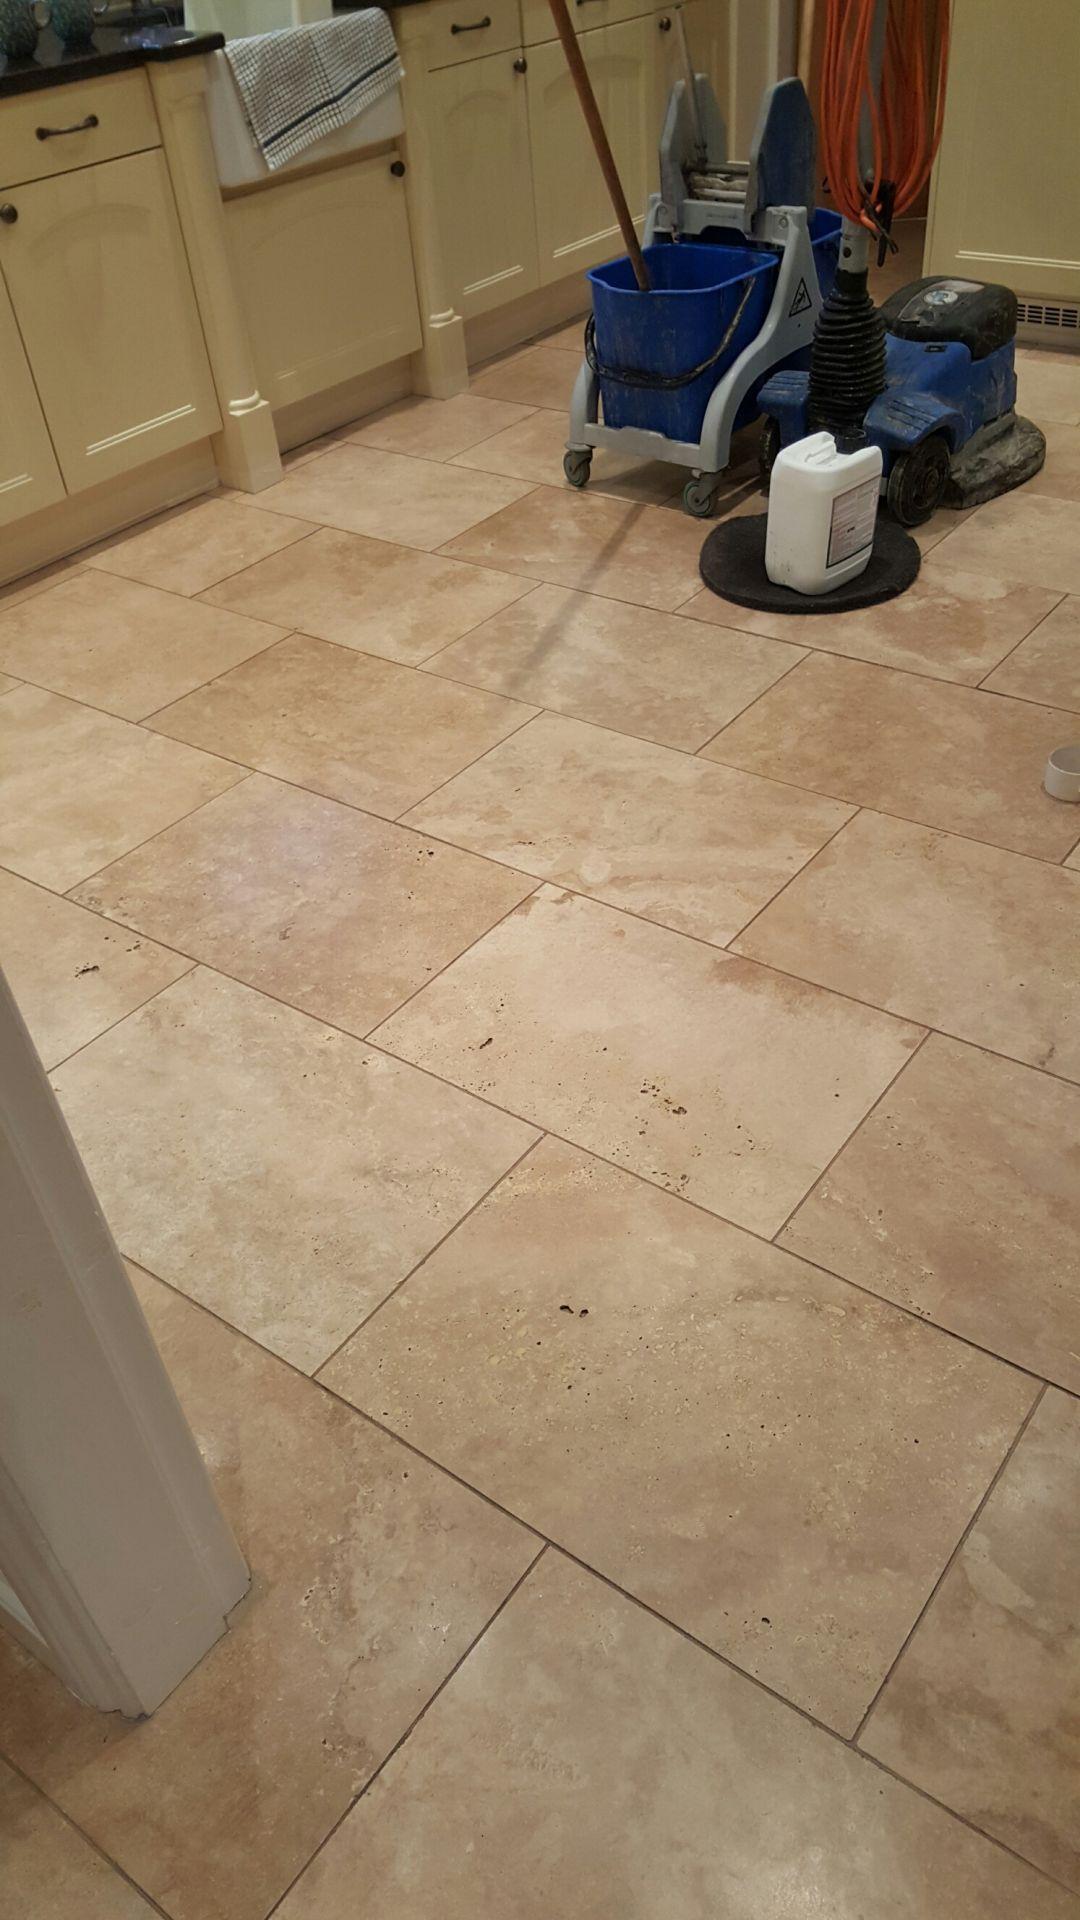 Stone Floor Cleaning Tiled Floor Cleaning Lincs Floor